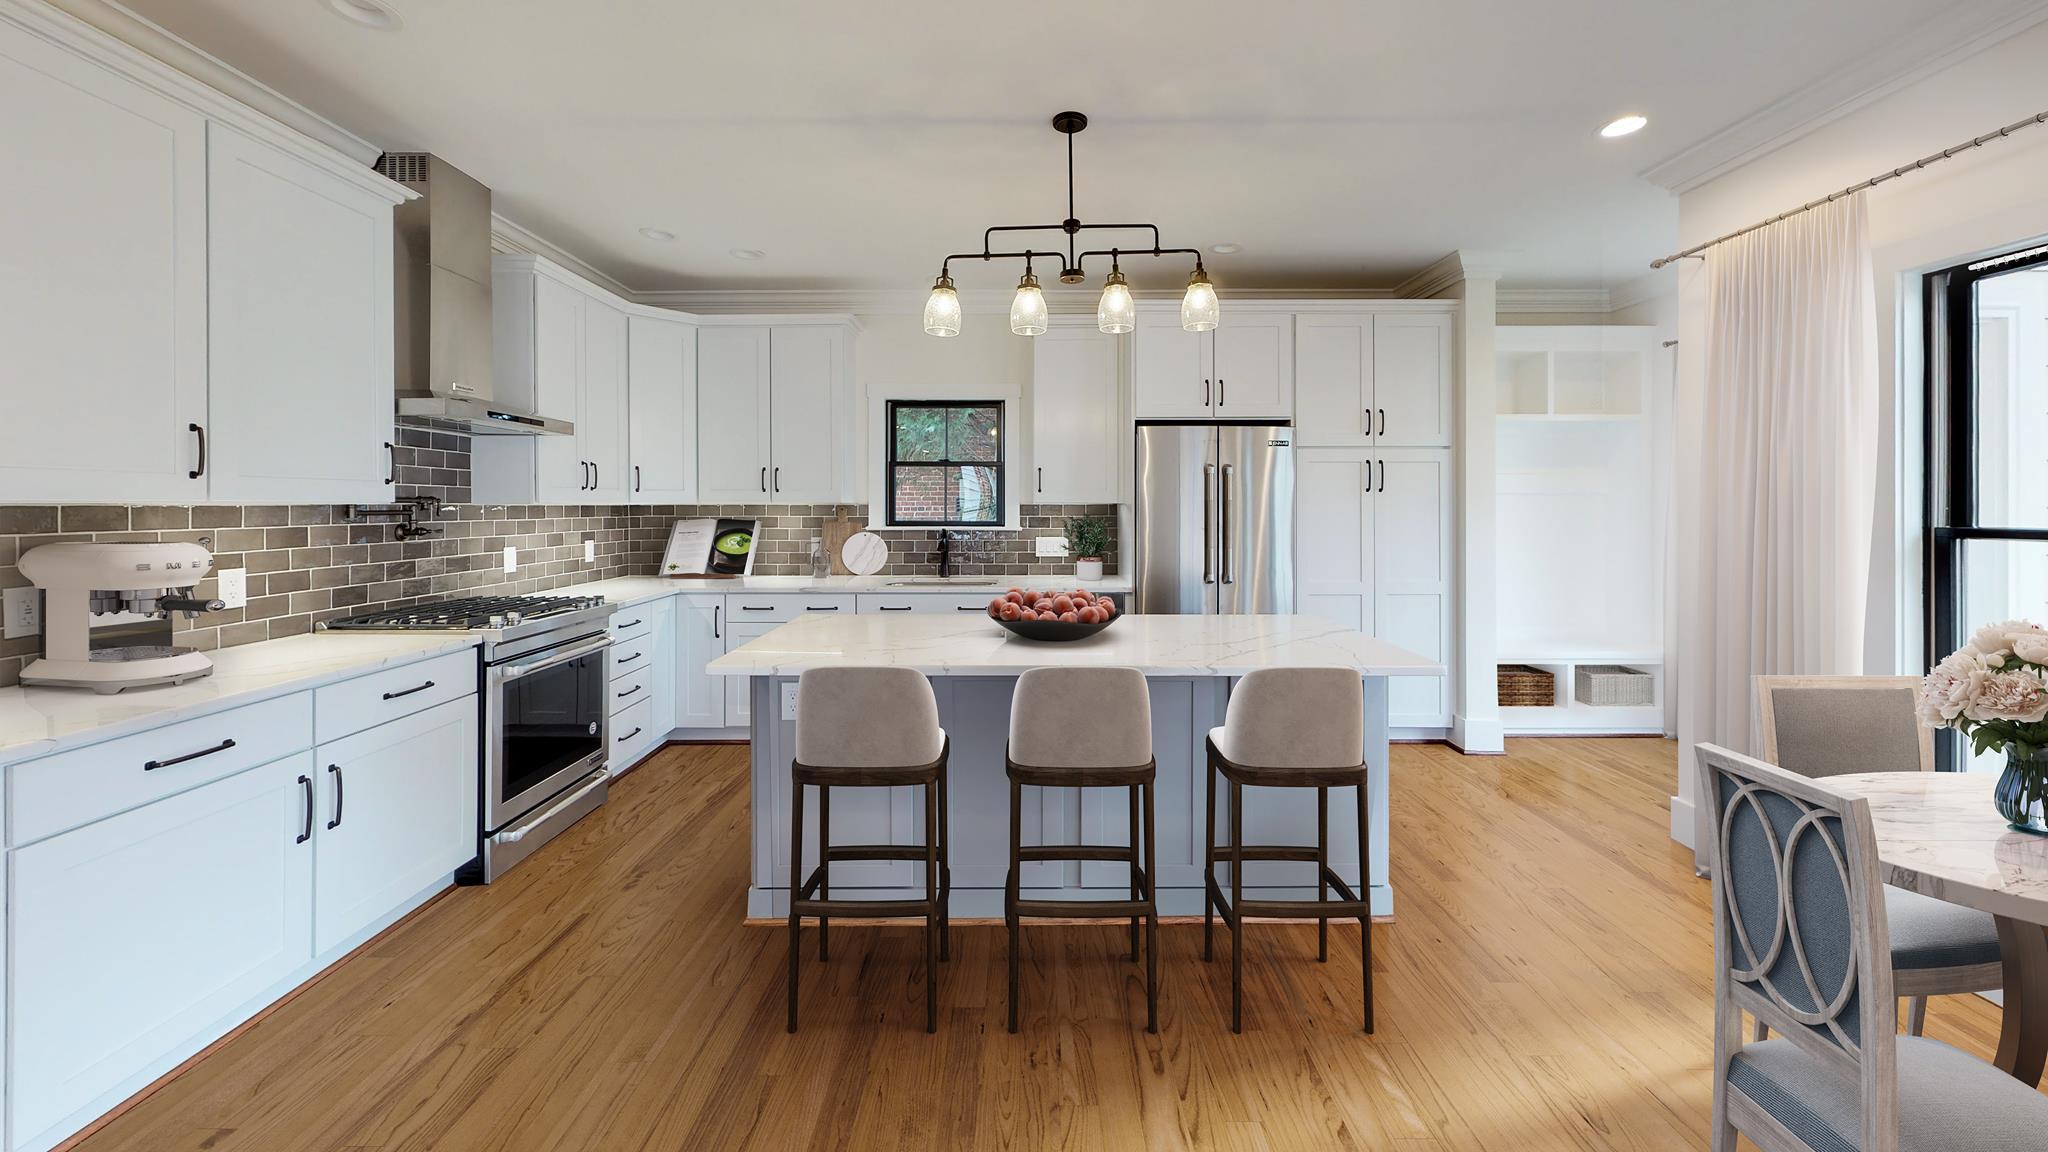 Shop Titan Factory Direct: The Smart Housing Choice